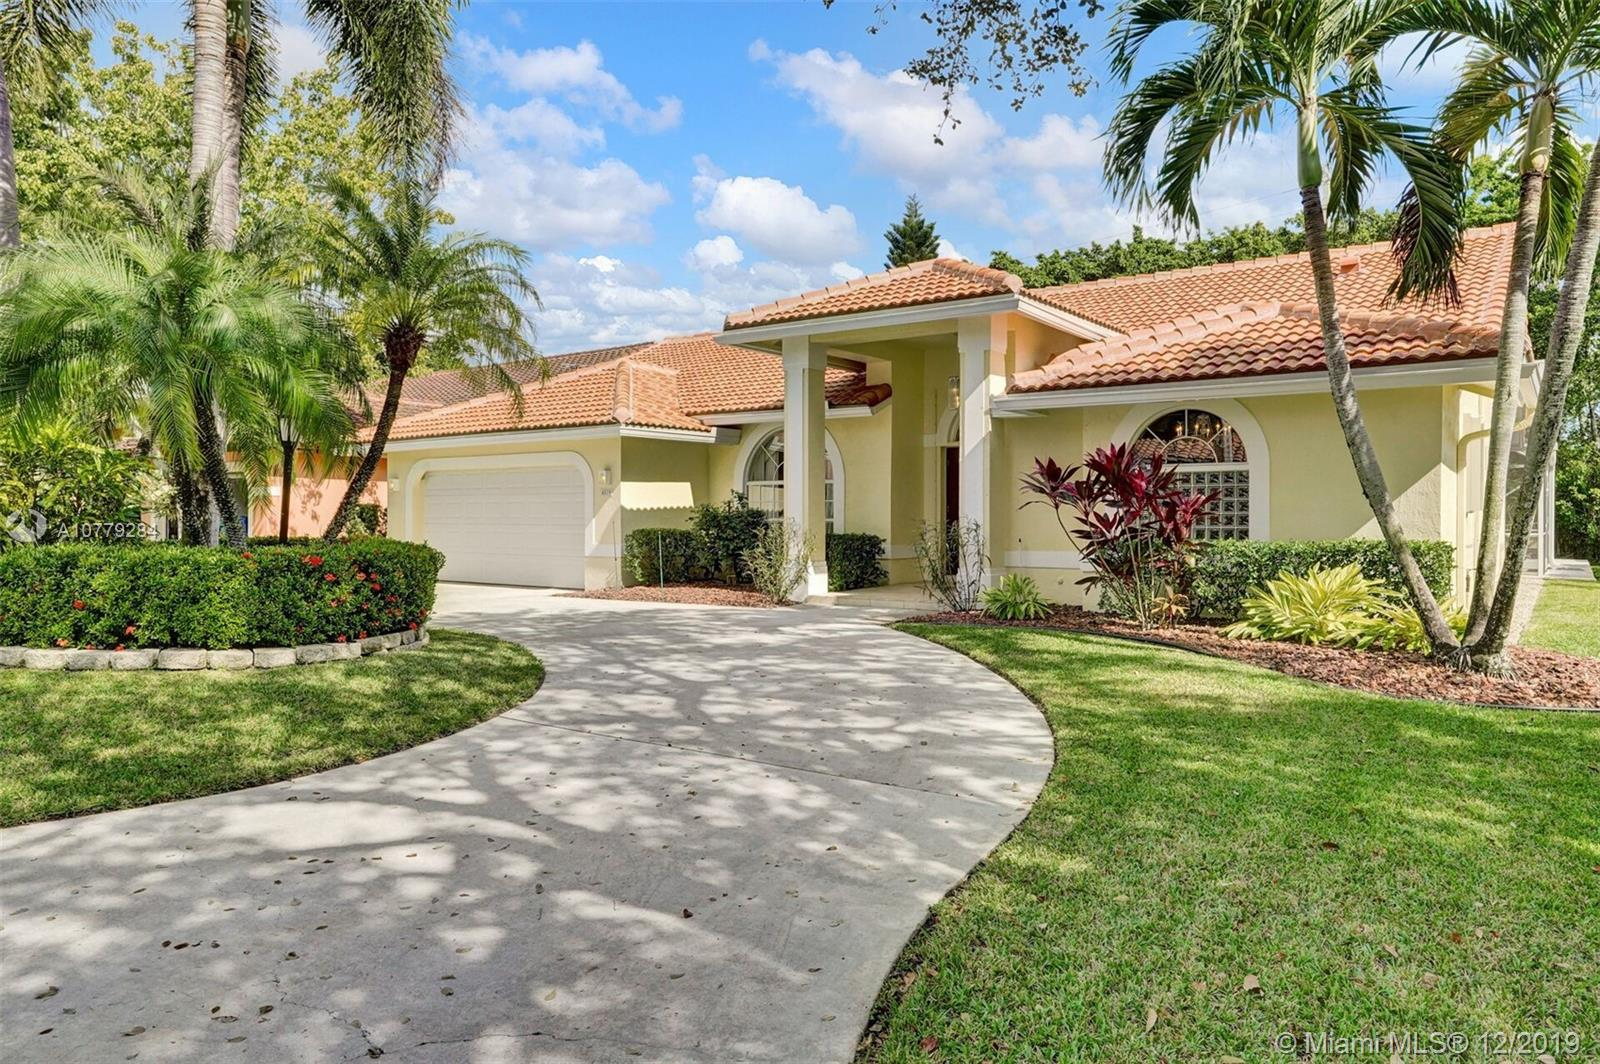 4879 Rothschild Dr, Coral Springs, FL 33067